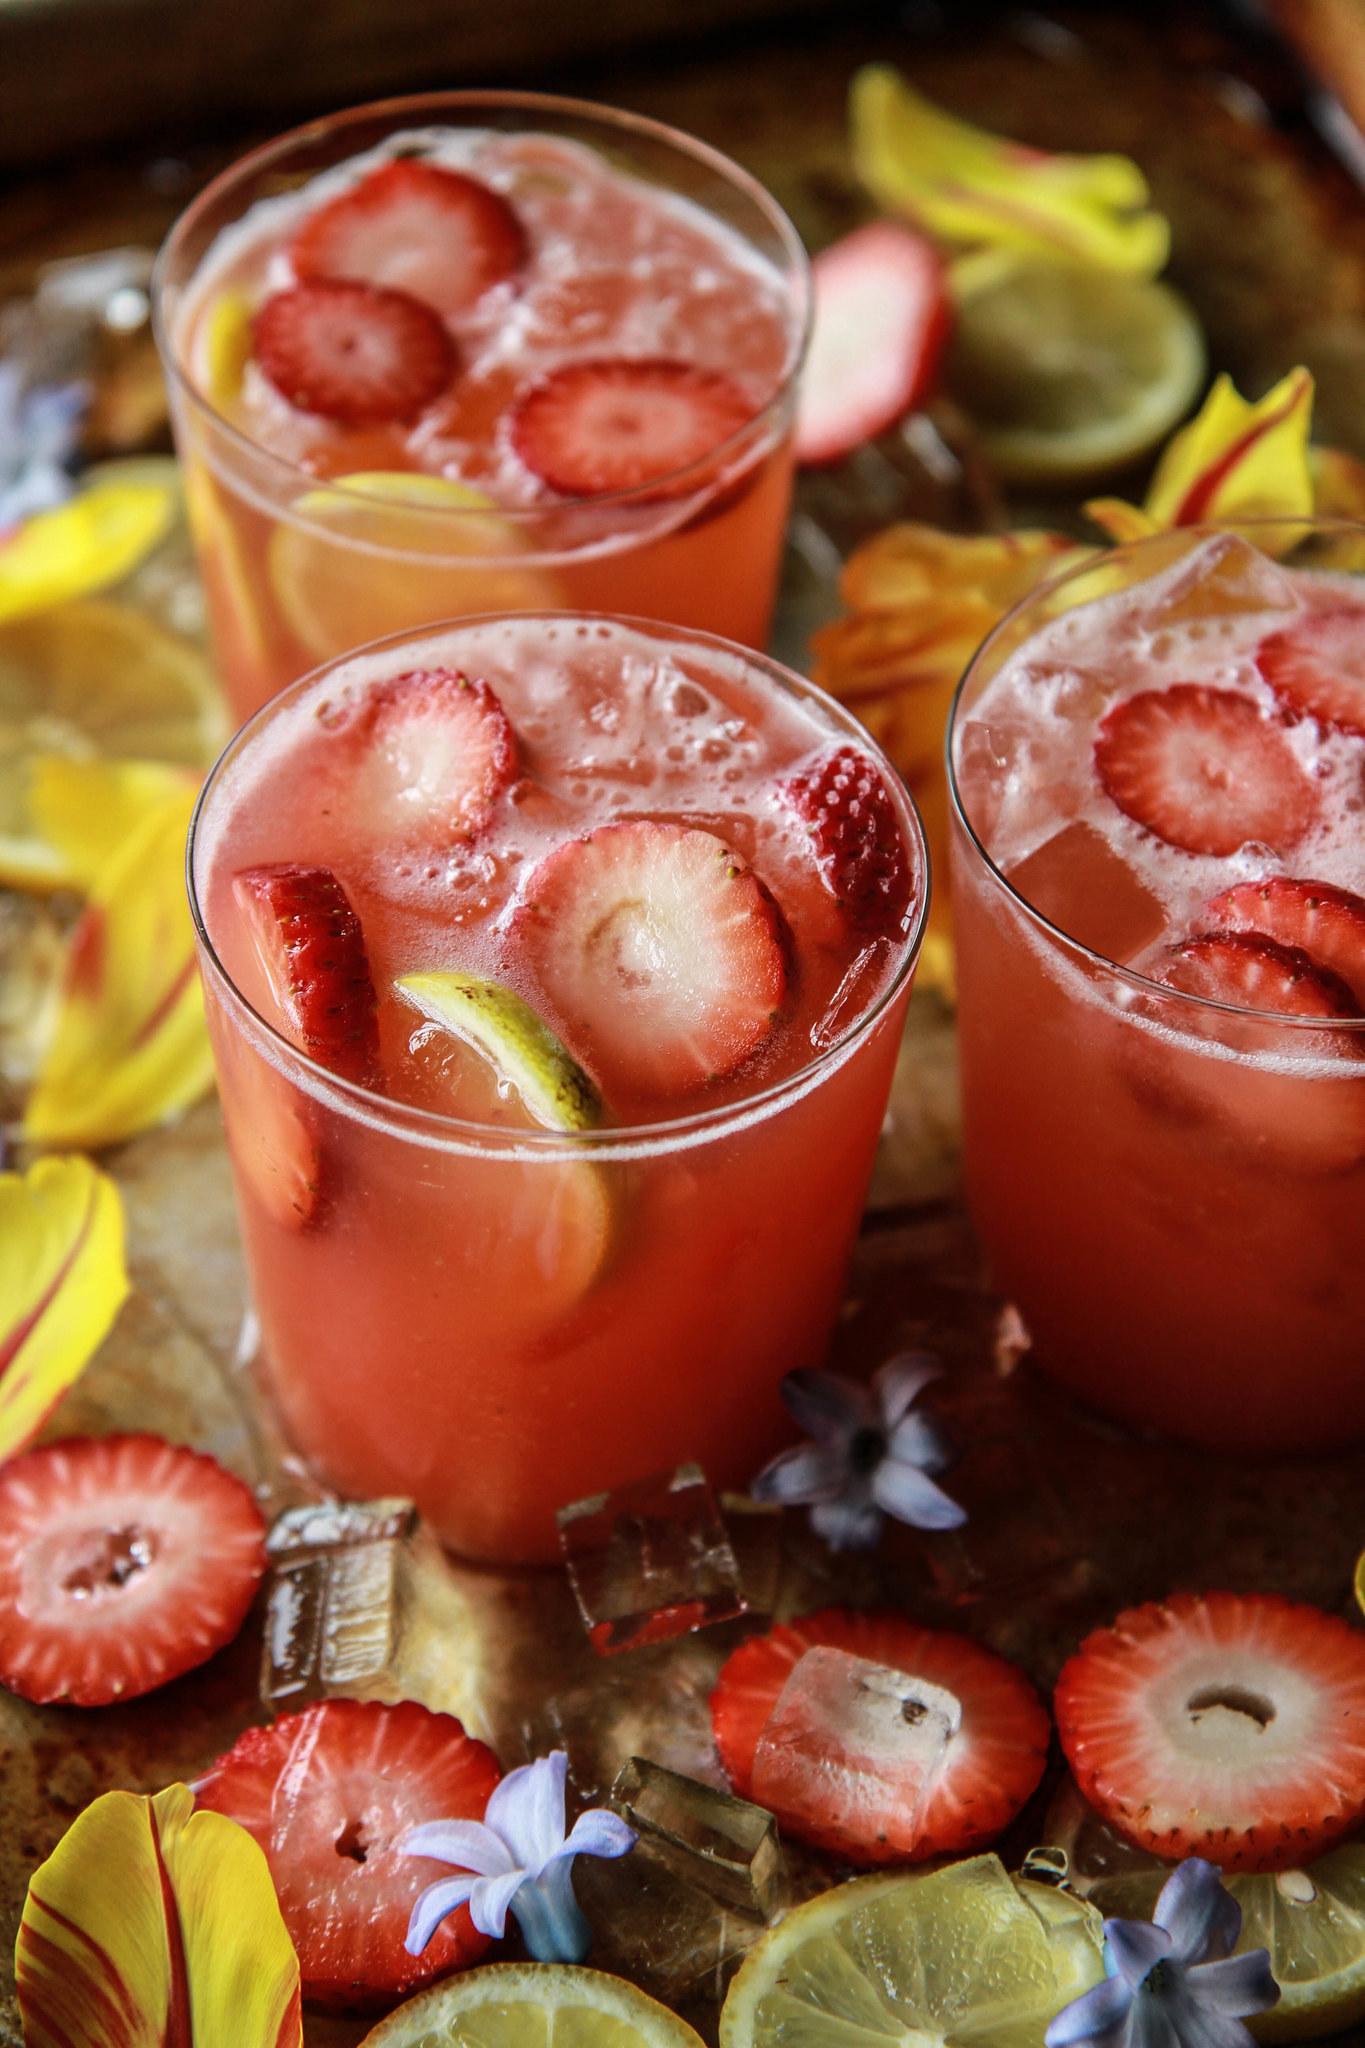 Three glasses of strawberry vodka lemonade with fresh berries and lemon.